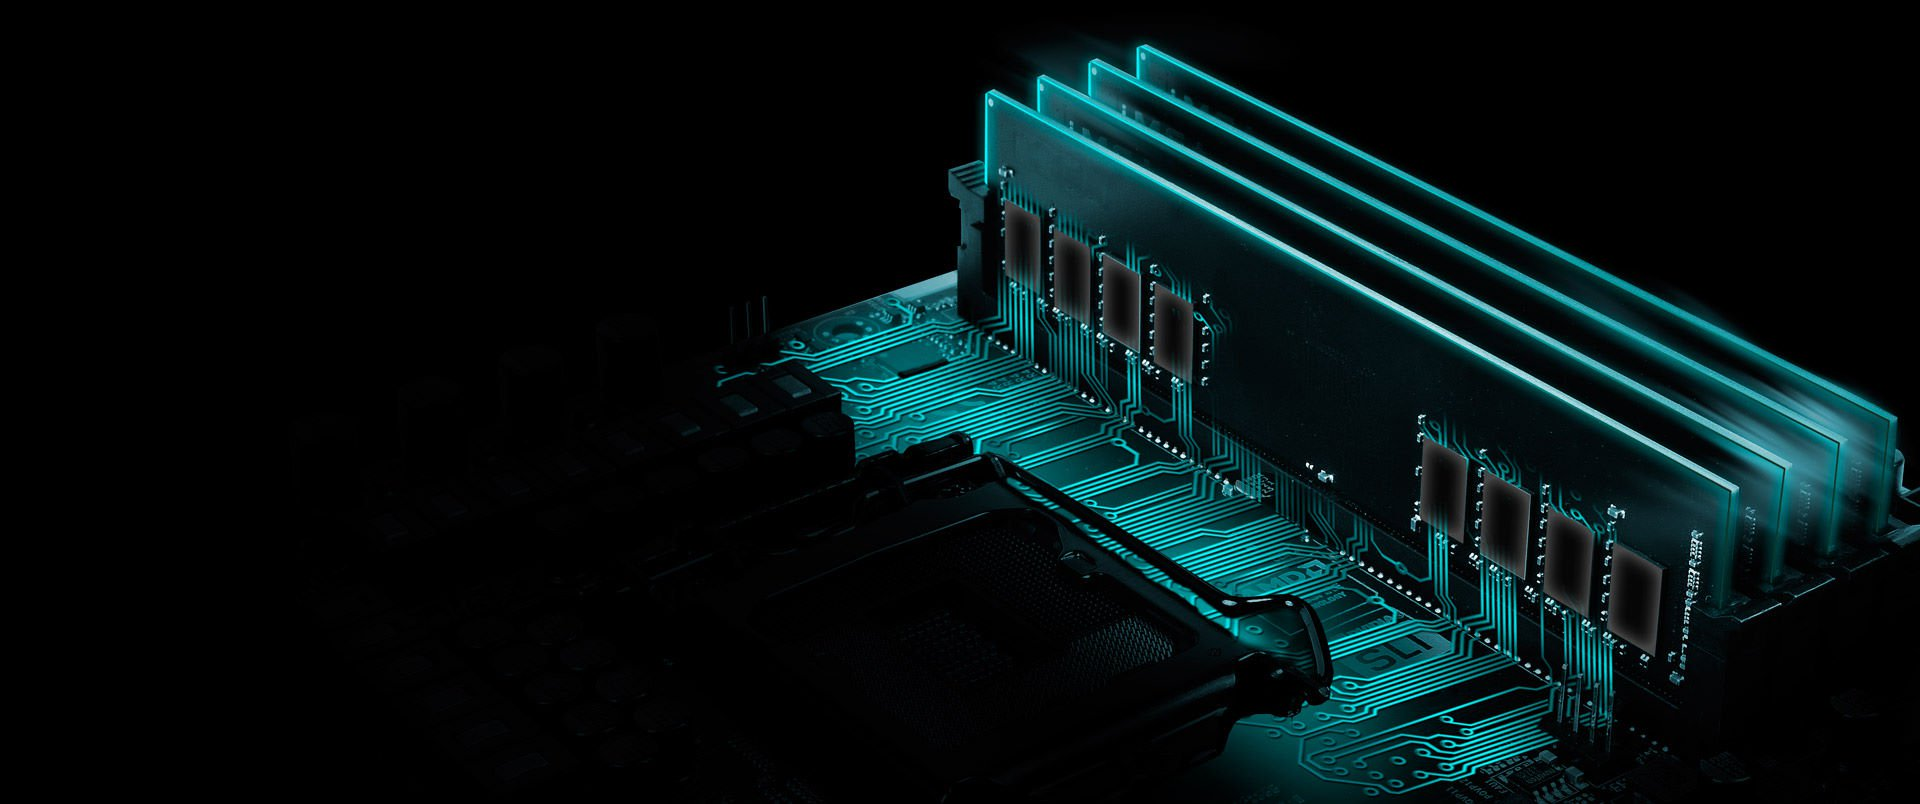 HyperDDR4-Z370M%20Pro4.jpg